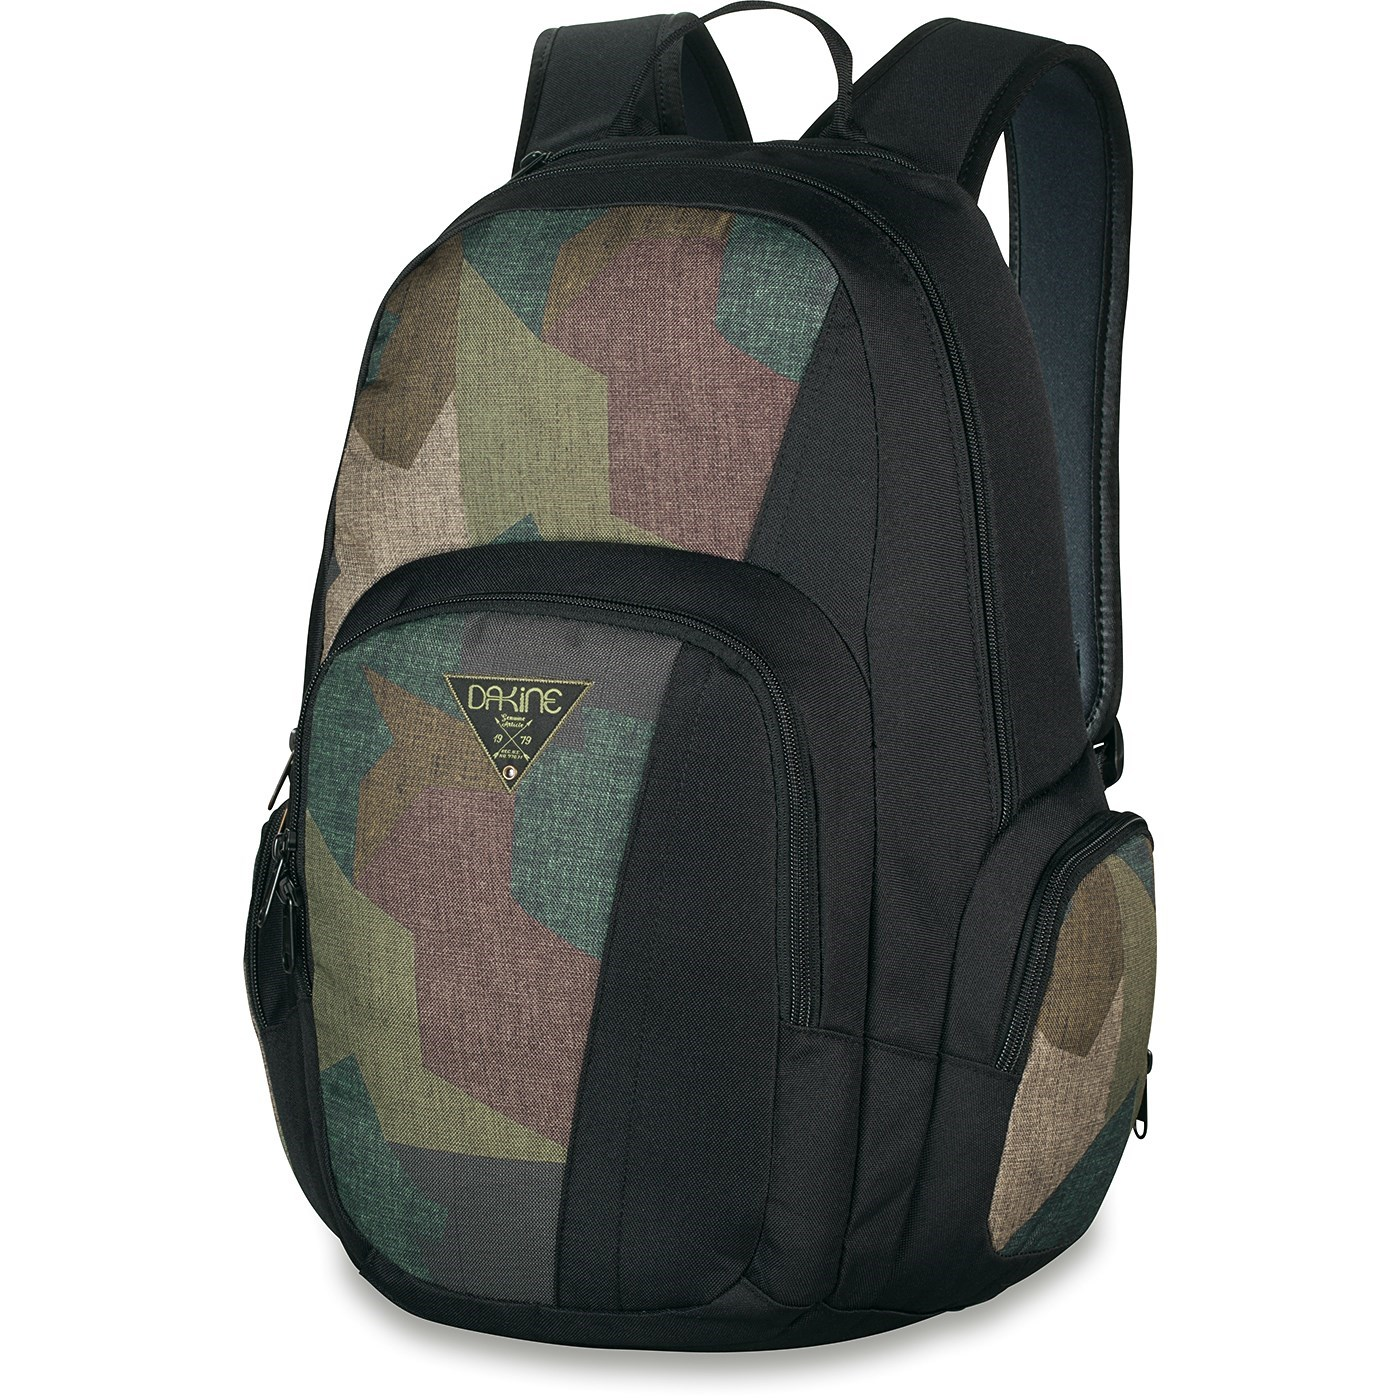 DaKine Finley 25L Backpack (For Women) - Save 55%